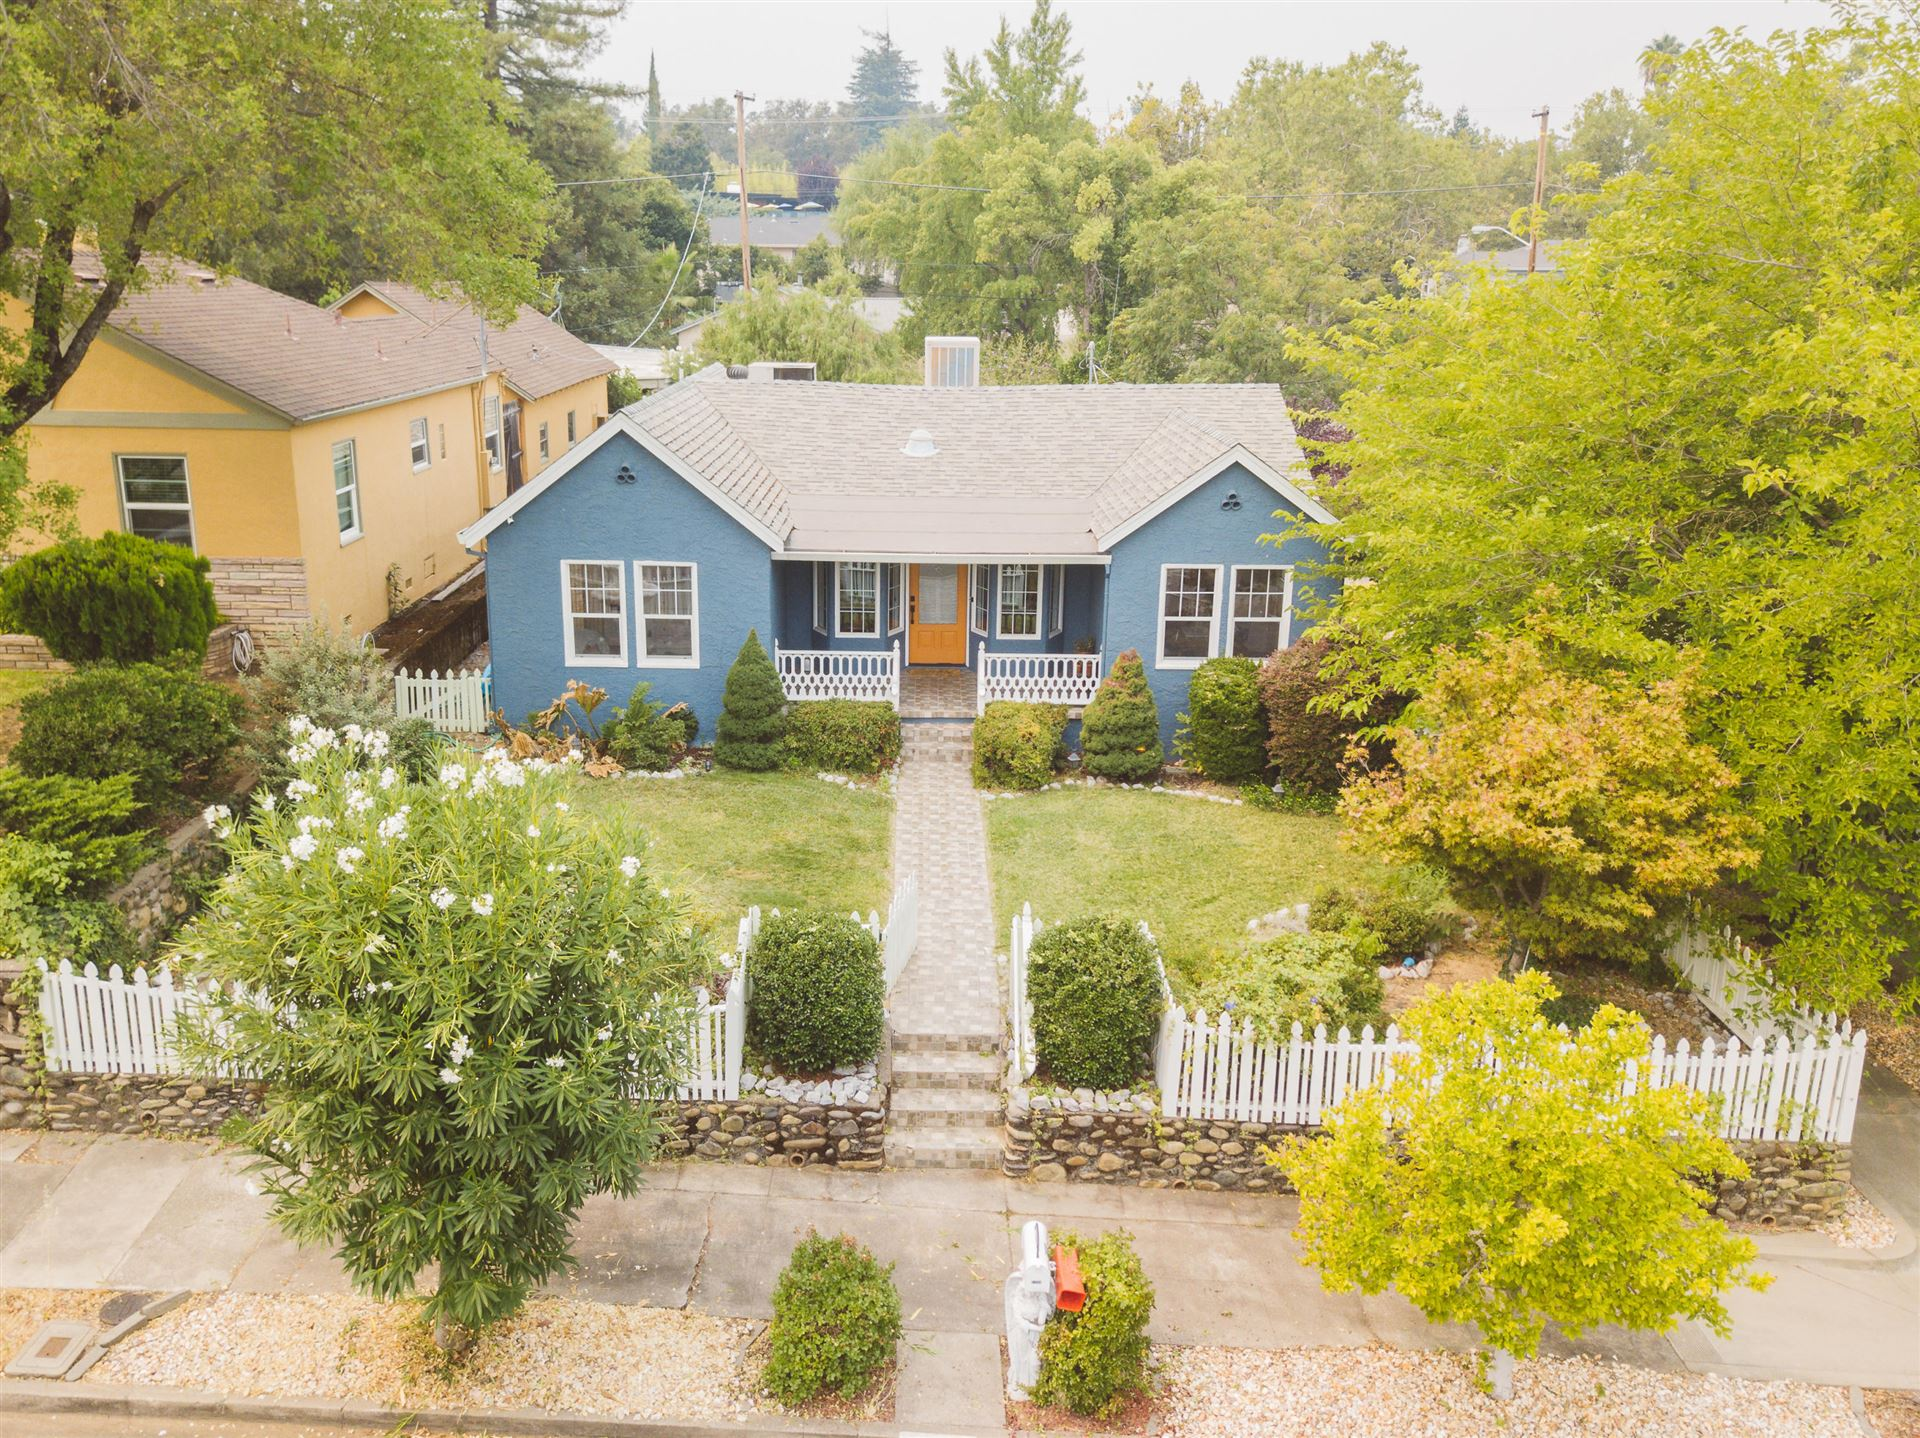 1204 Walnut Ave, Redding, CA 96001 - MLS#: 20-4231